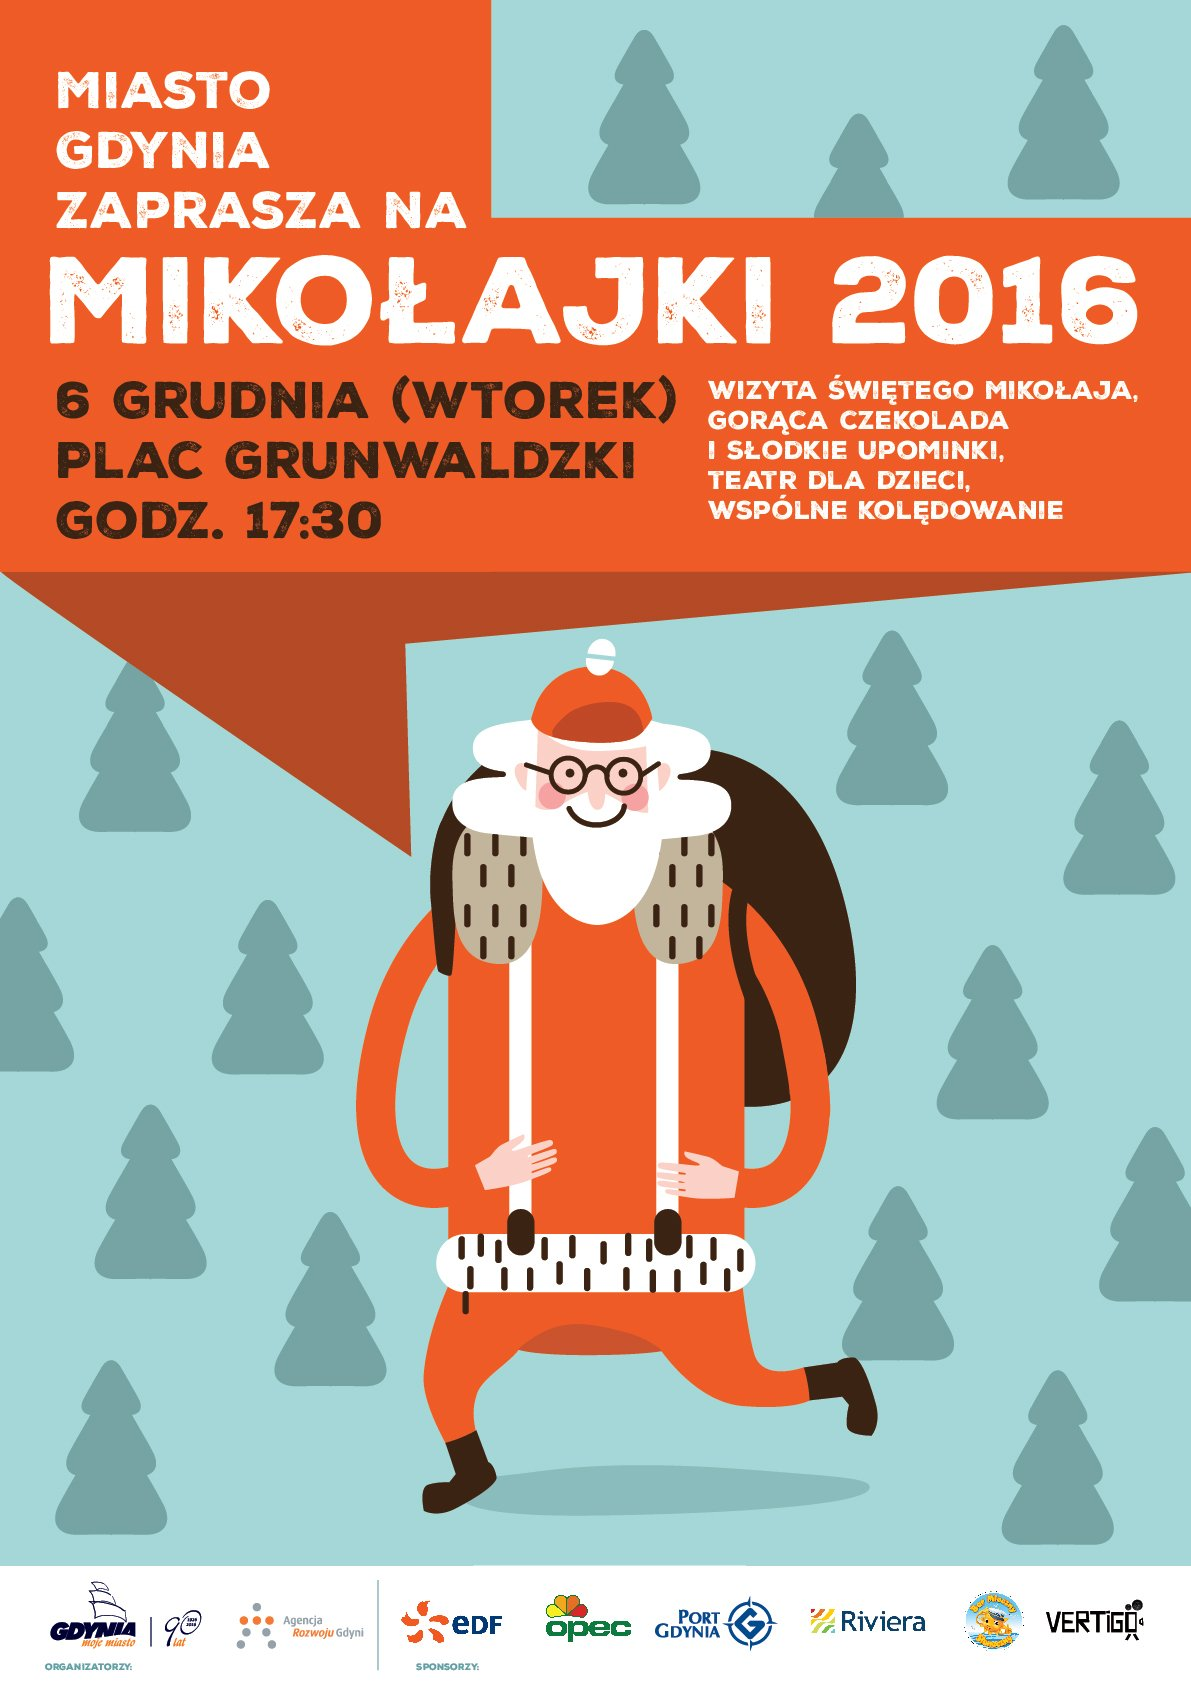 mikolajki-gdynia-2016